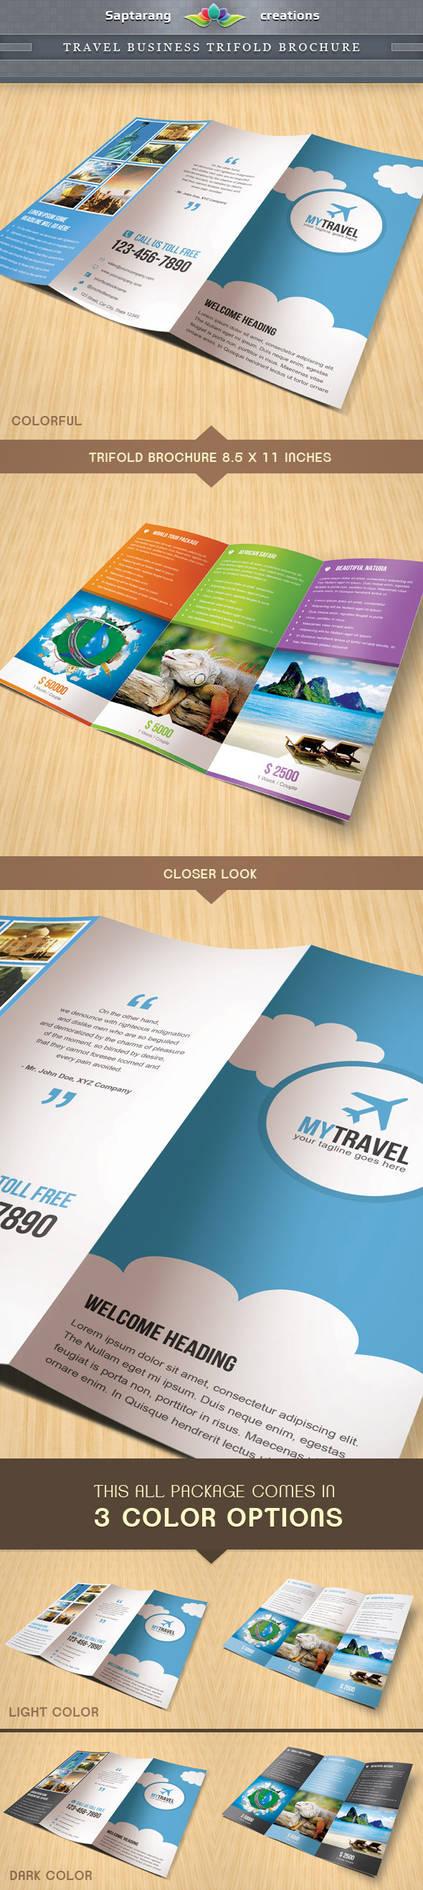 Travel Business Trifold Brochure by Saptarang